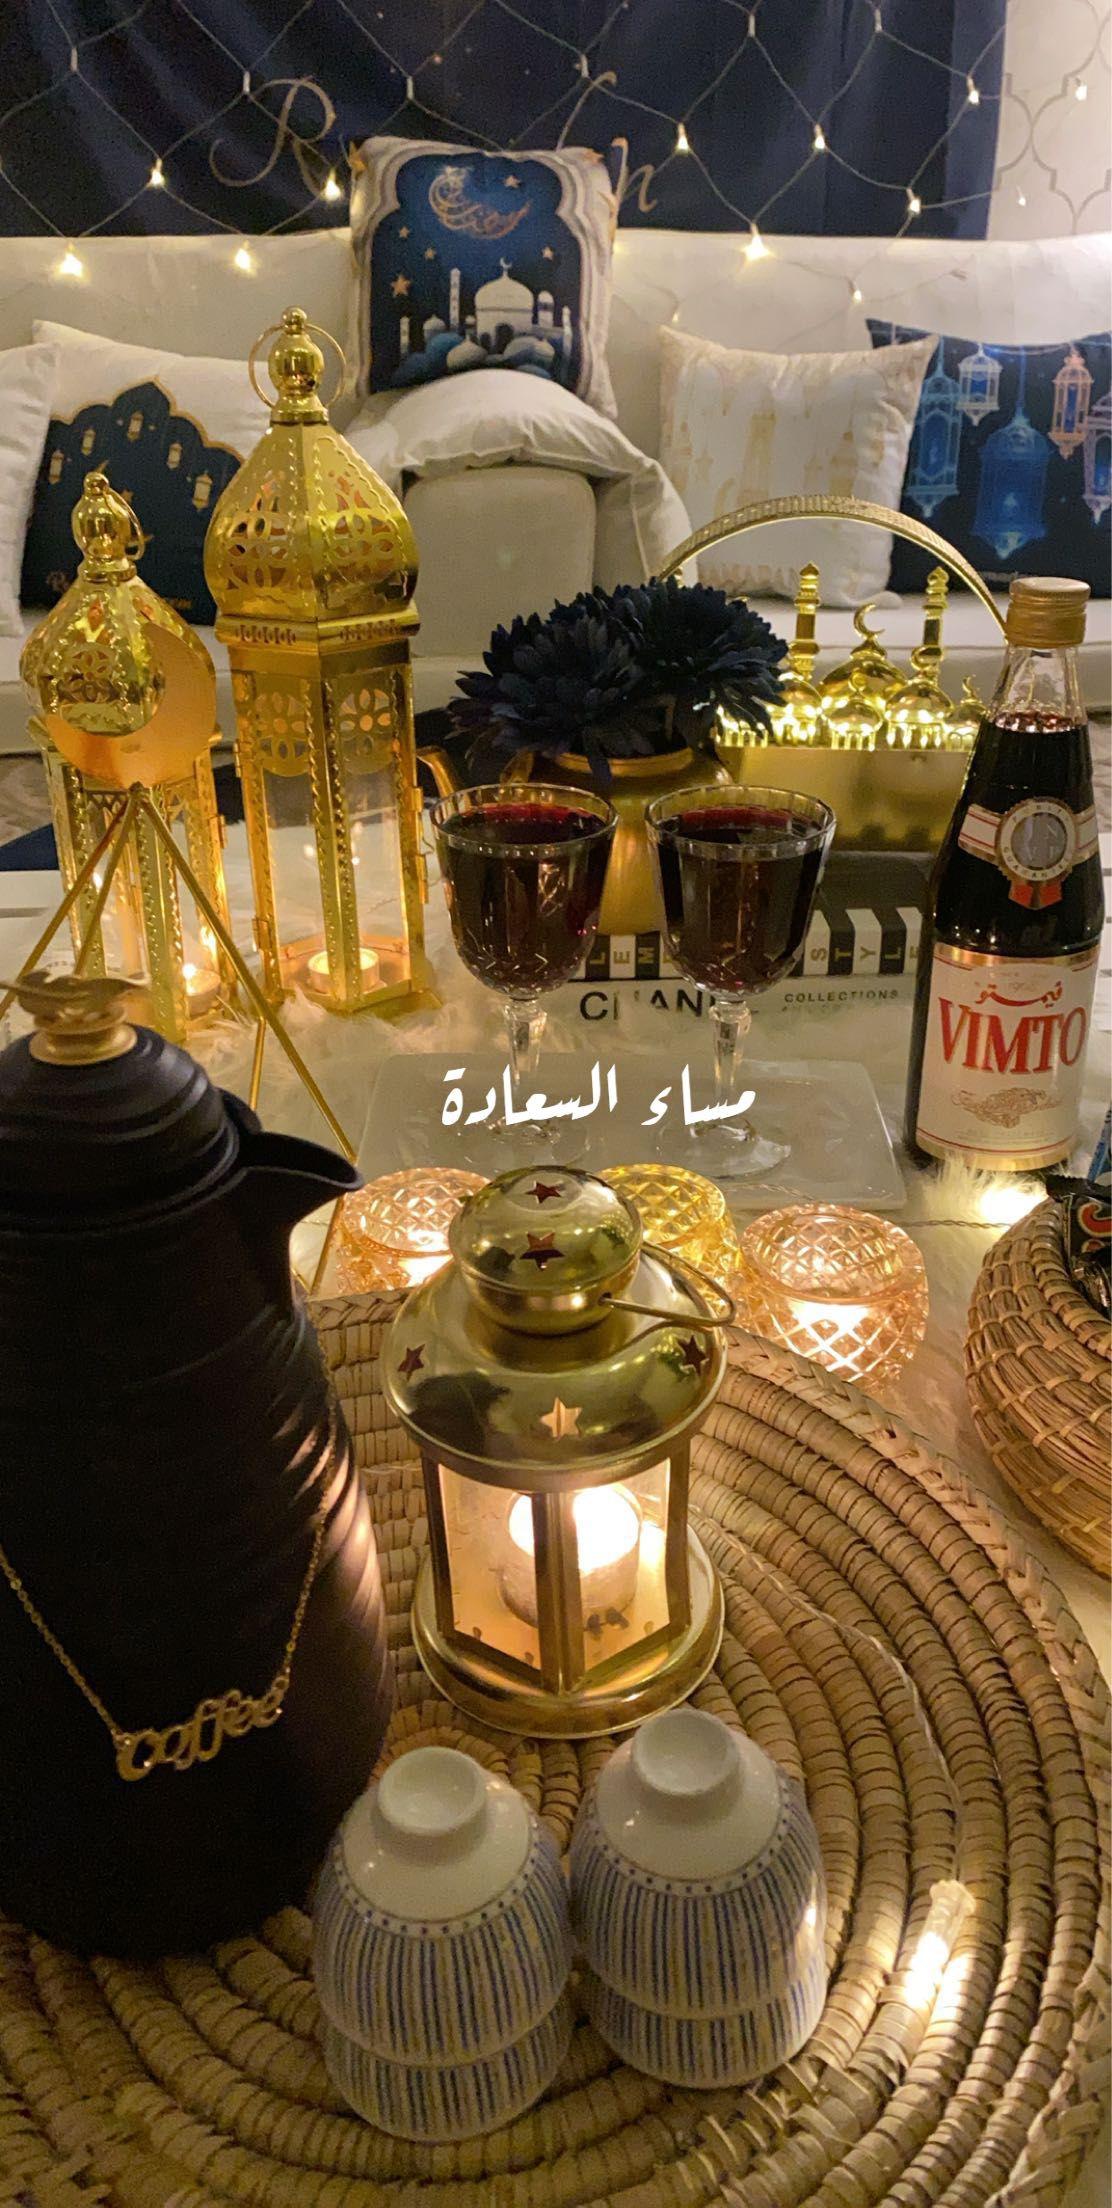 Pin By Ula Kh On رمضانيات In 2021 Ramadan Kareem Decoration Ramadan Gifts Ramadan Poster